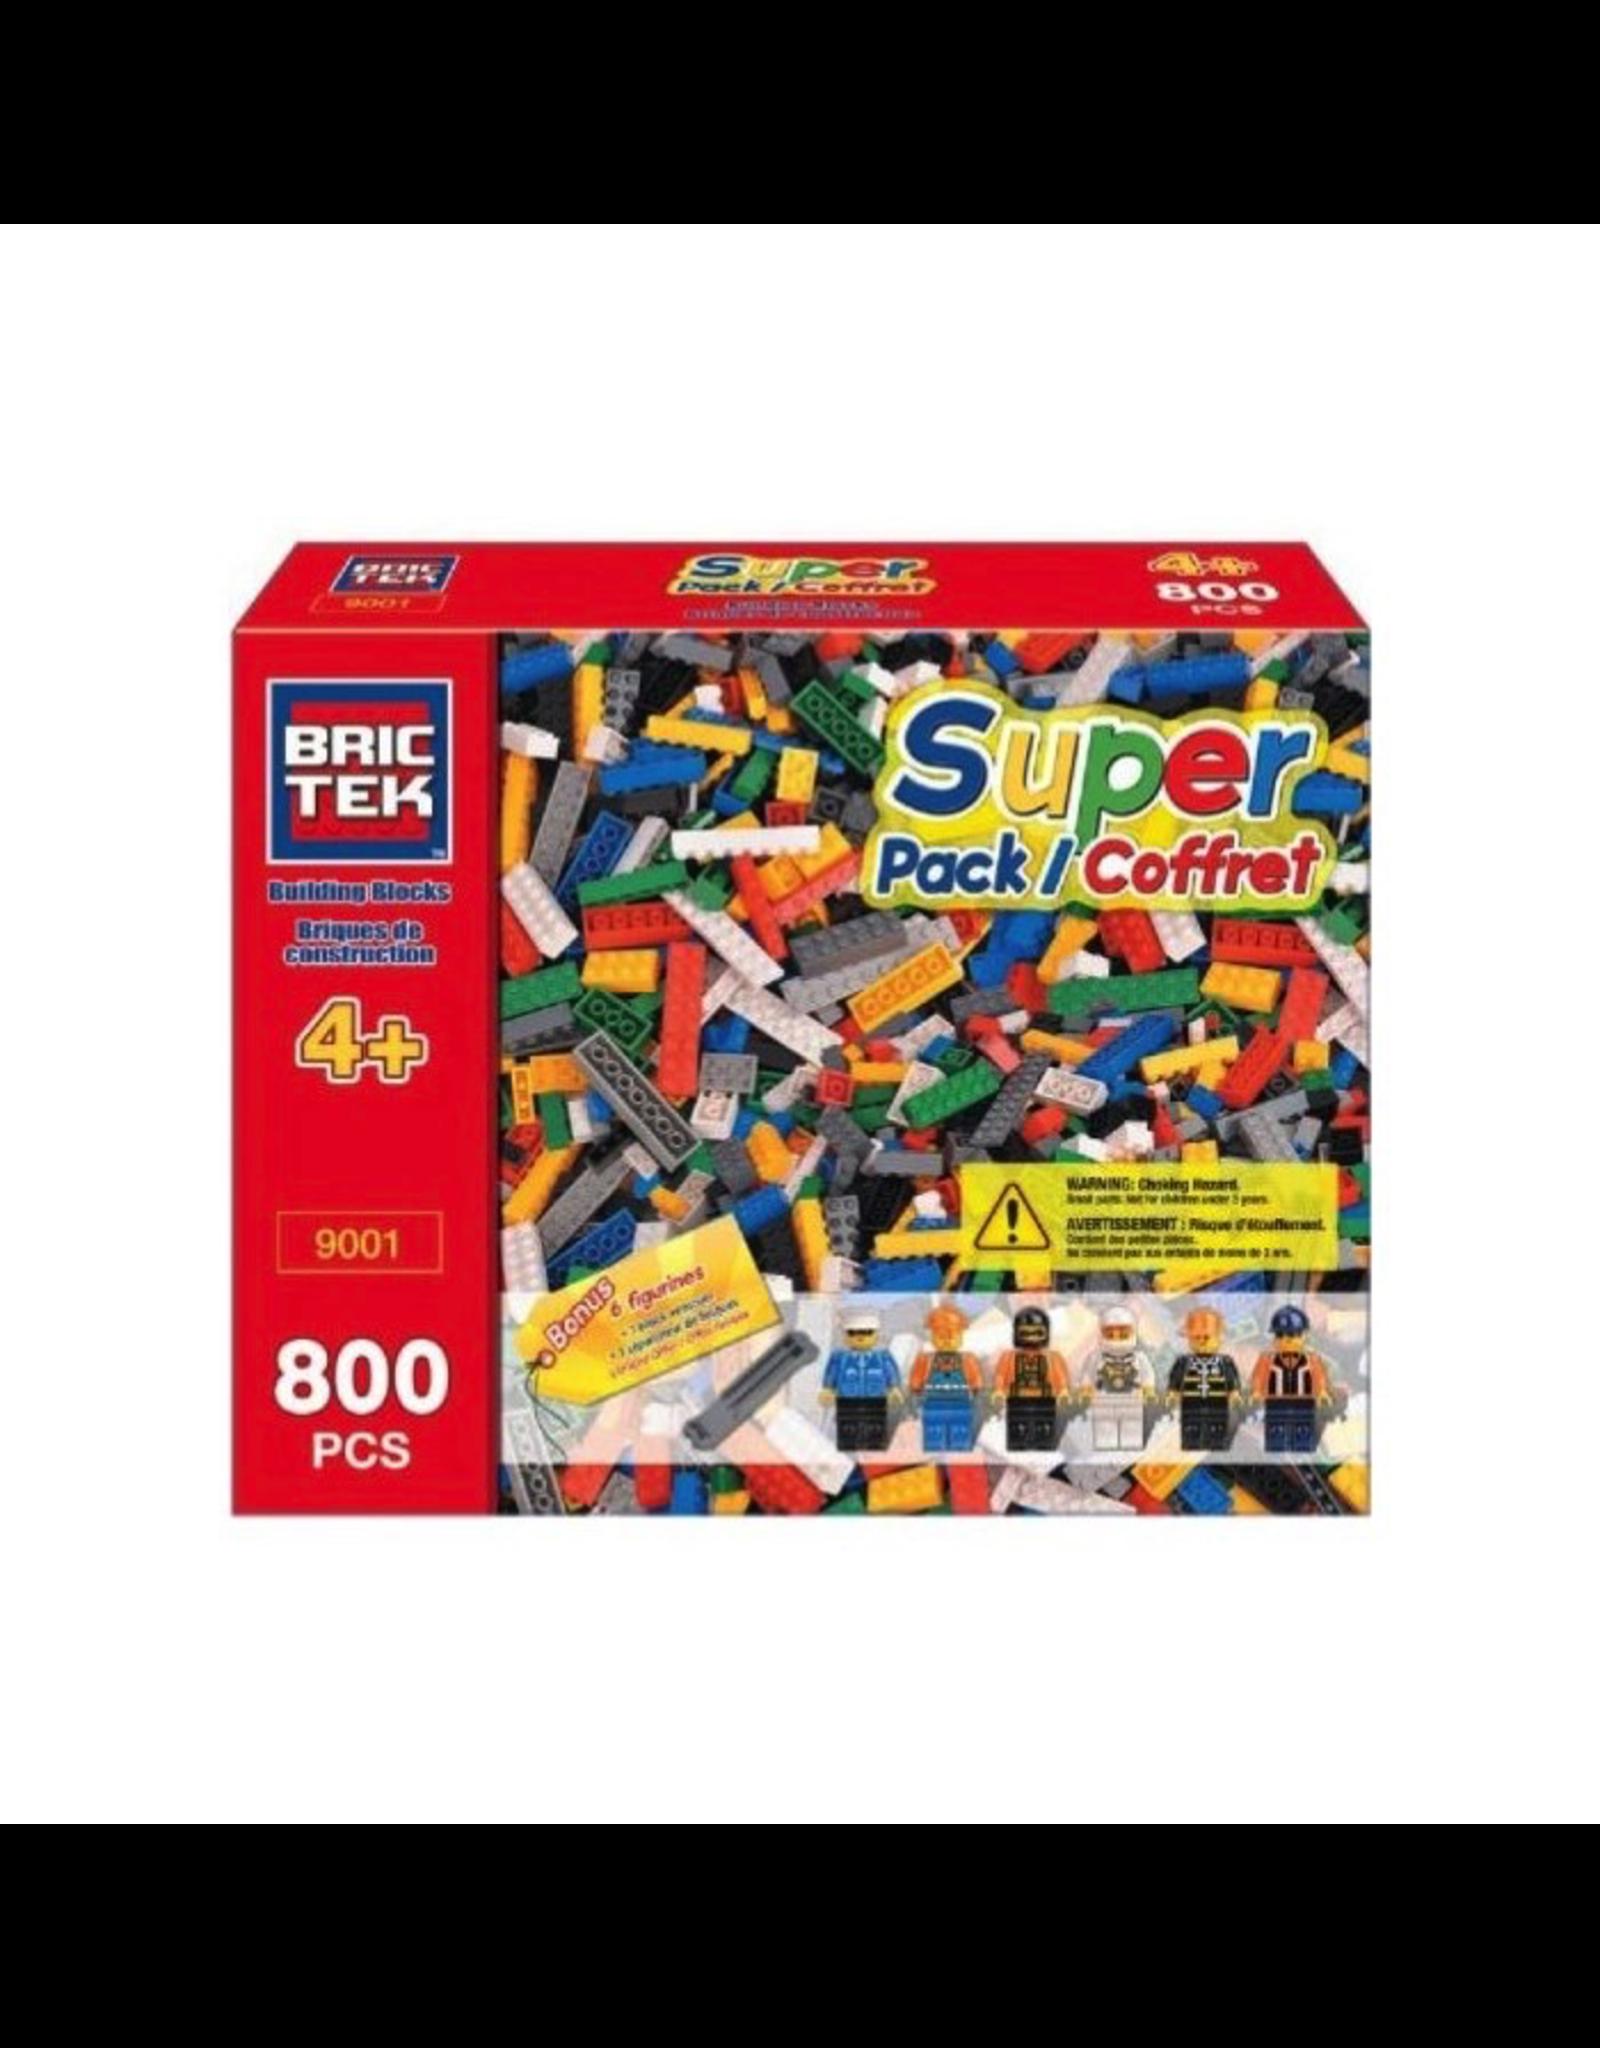 BRICTEK SUPER PACK 800 PCS